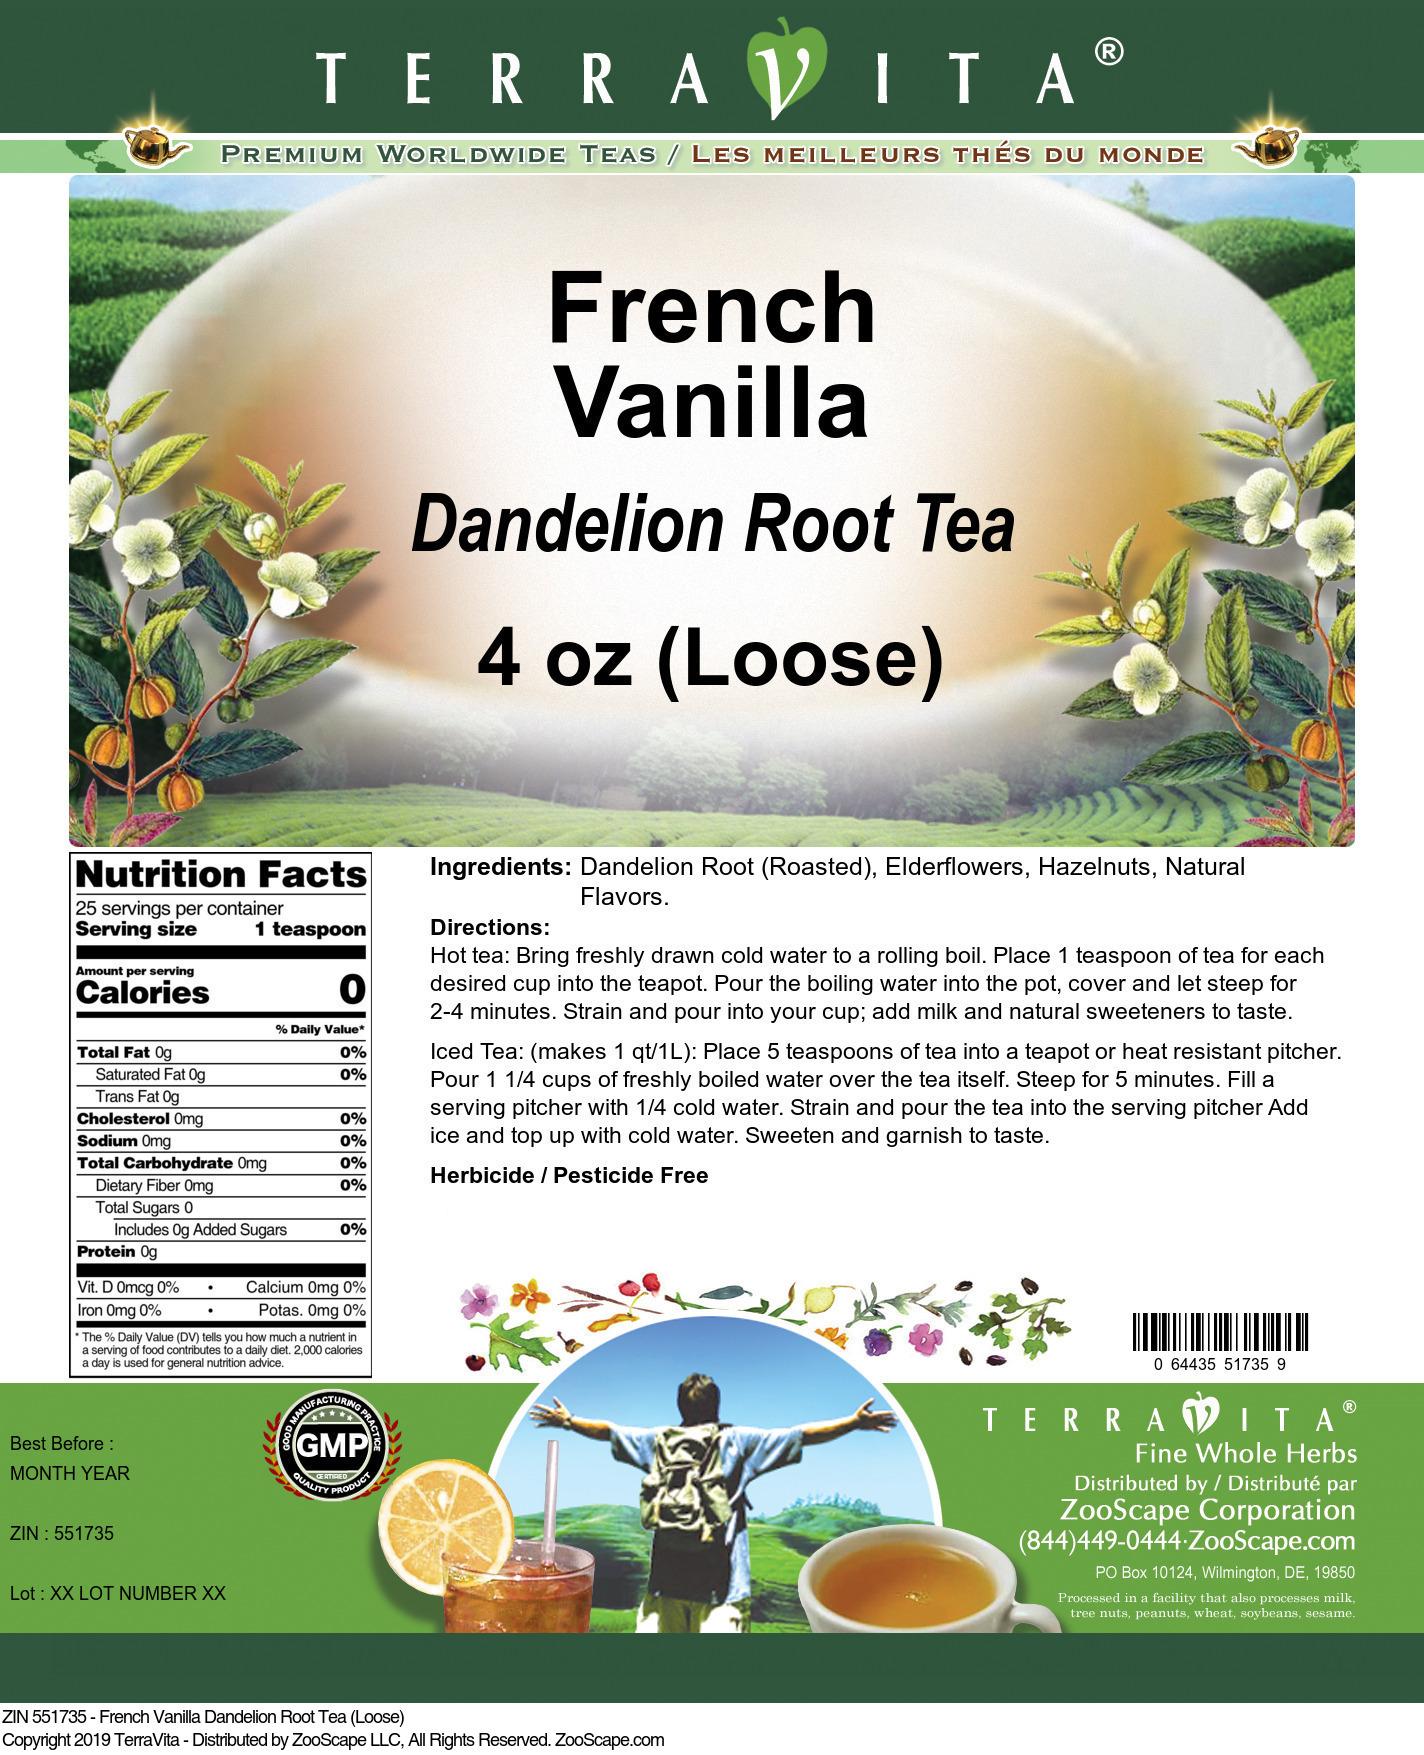 French Vanilla Dandelion Root